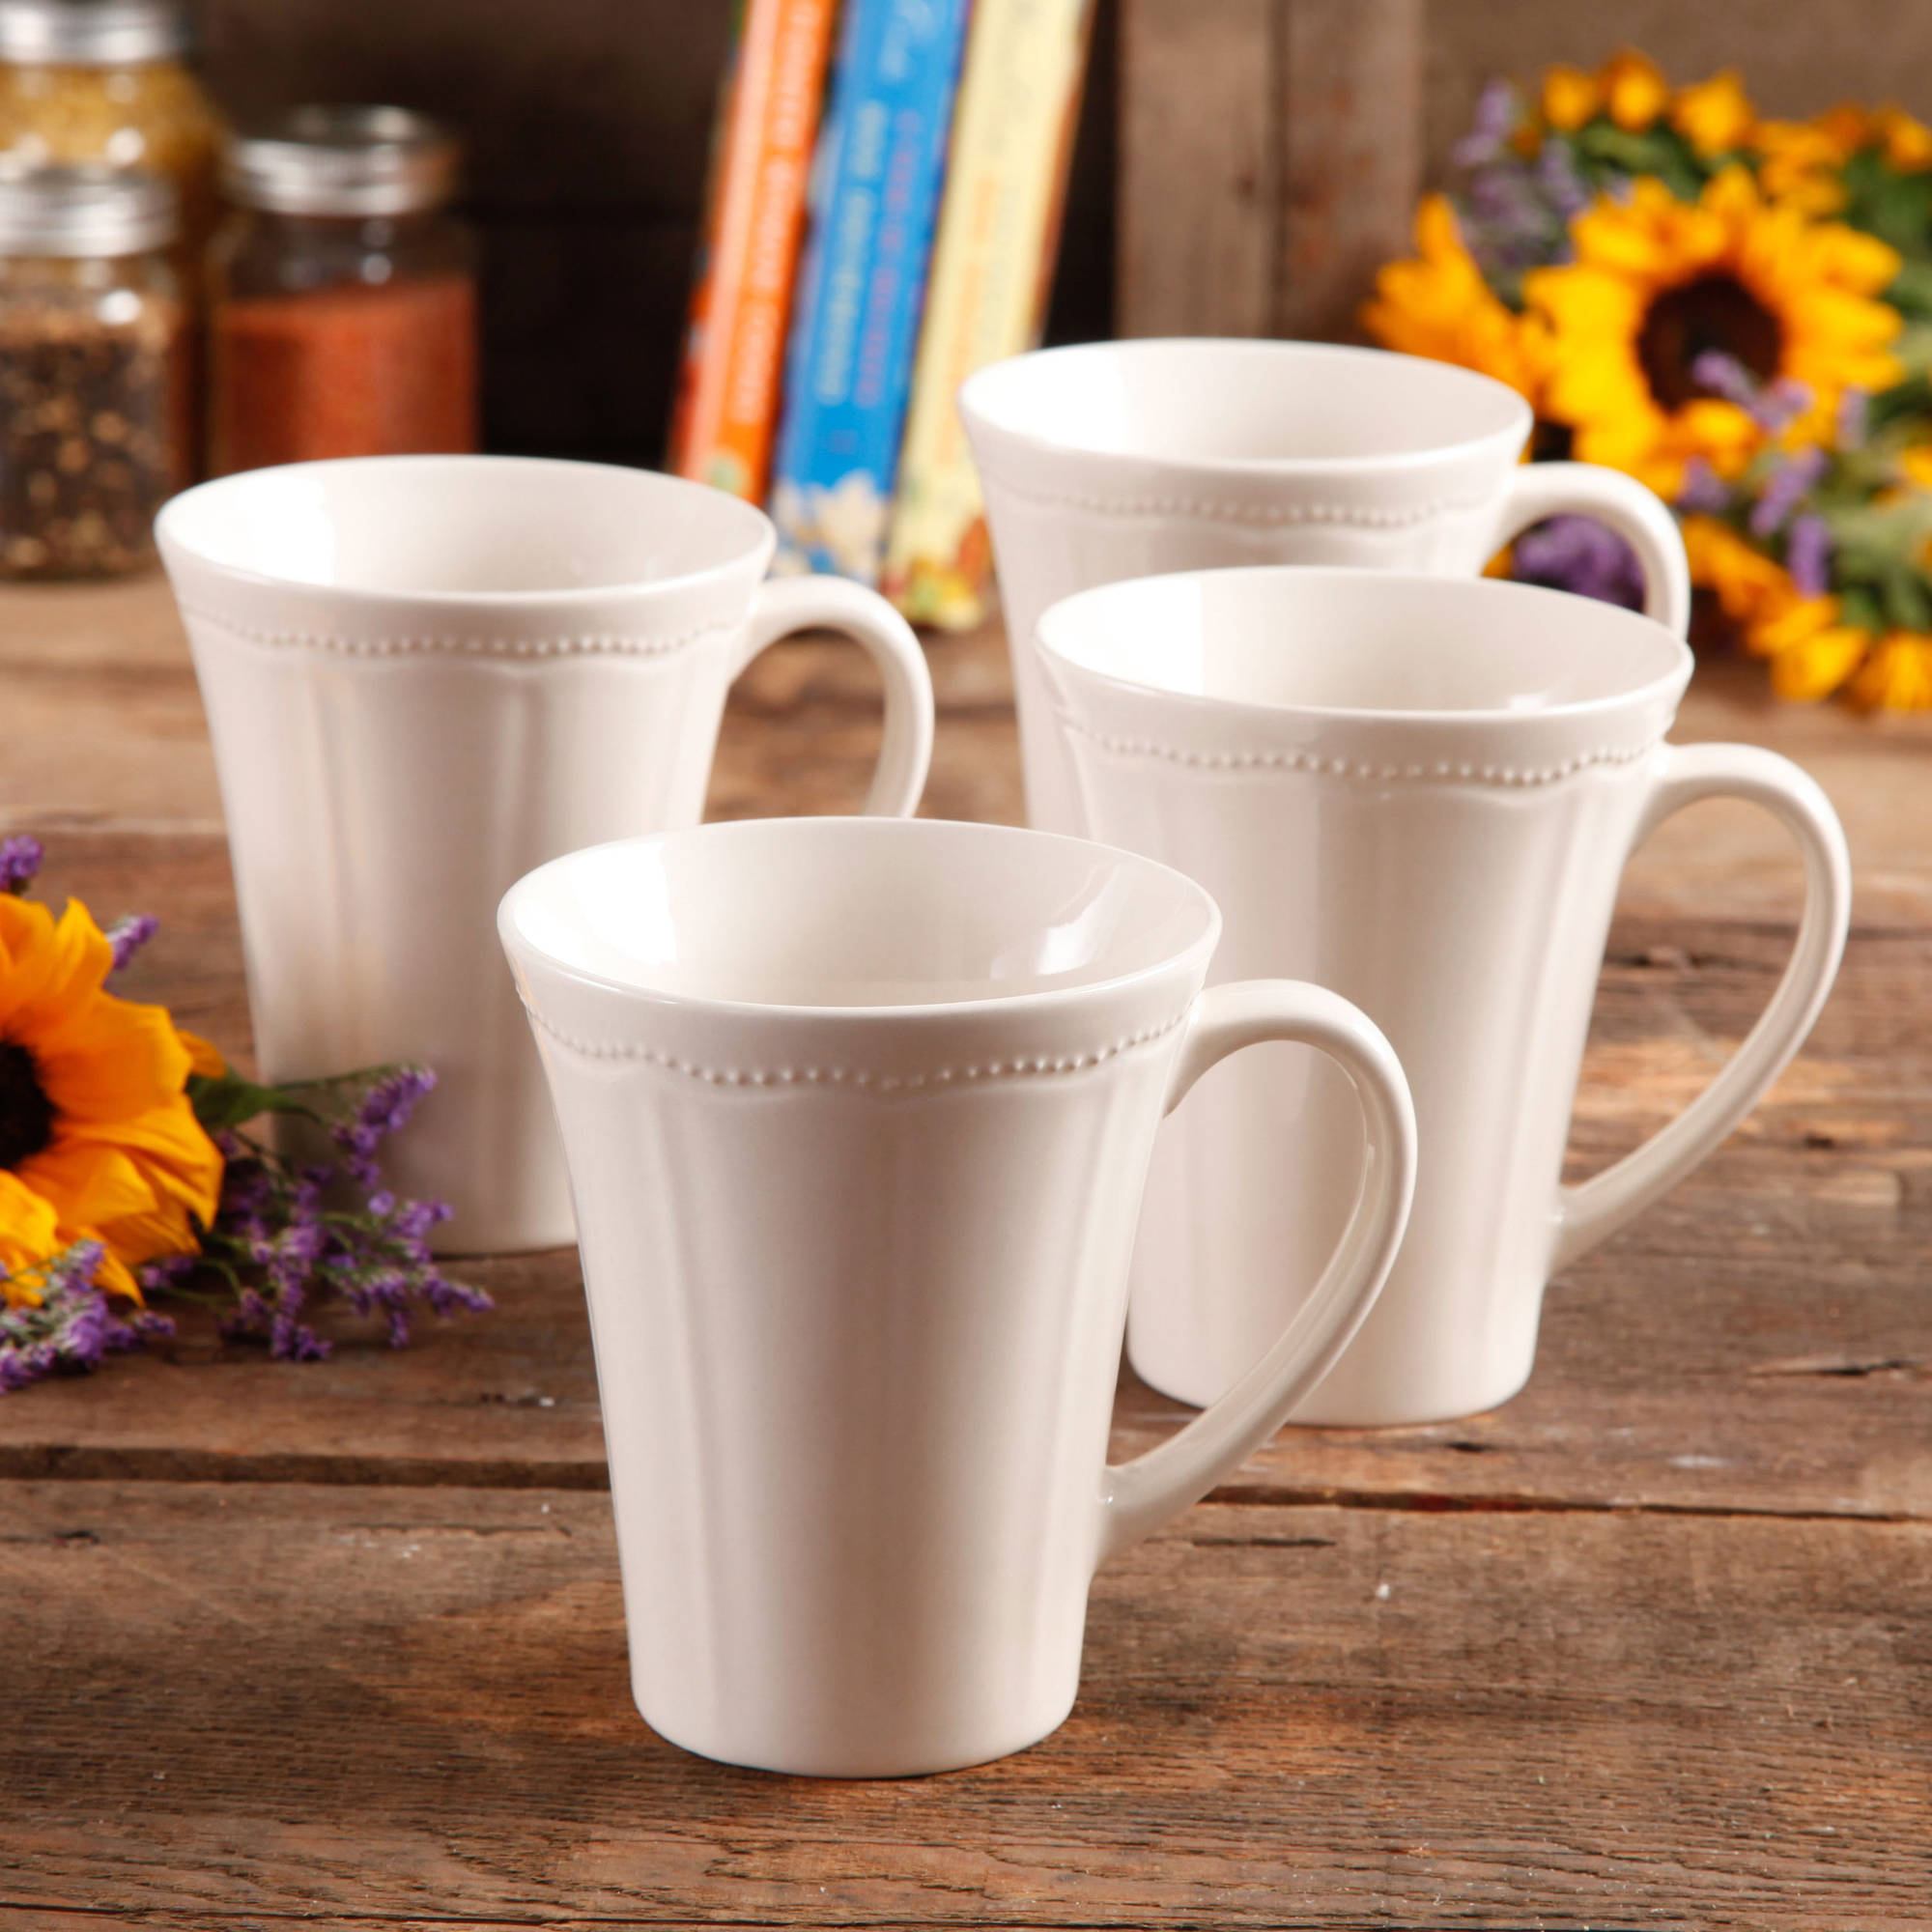 pioneer woman paige piece transparent glaze mug set  walmartcom -